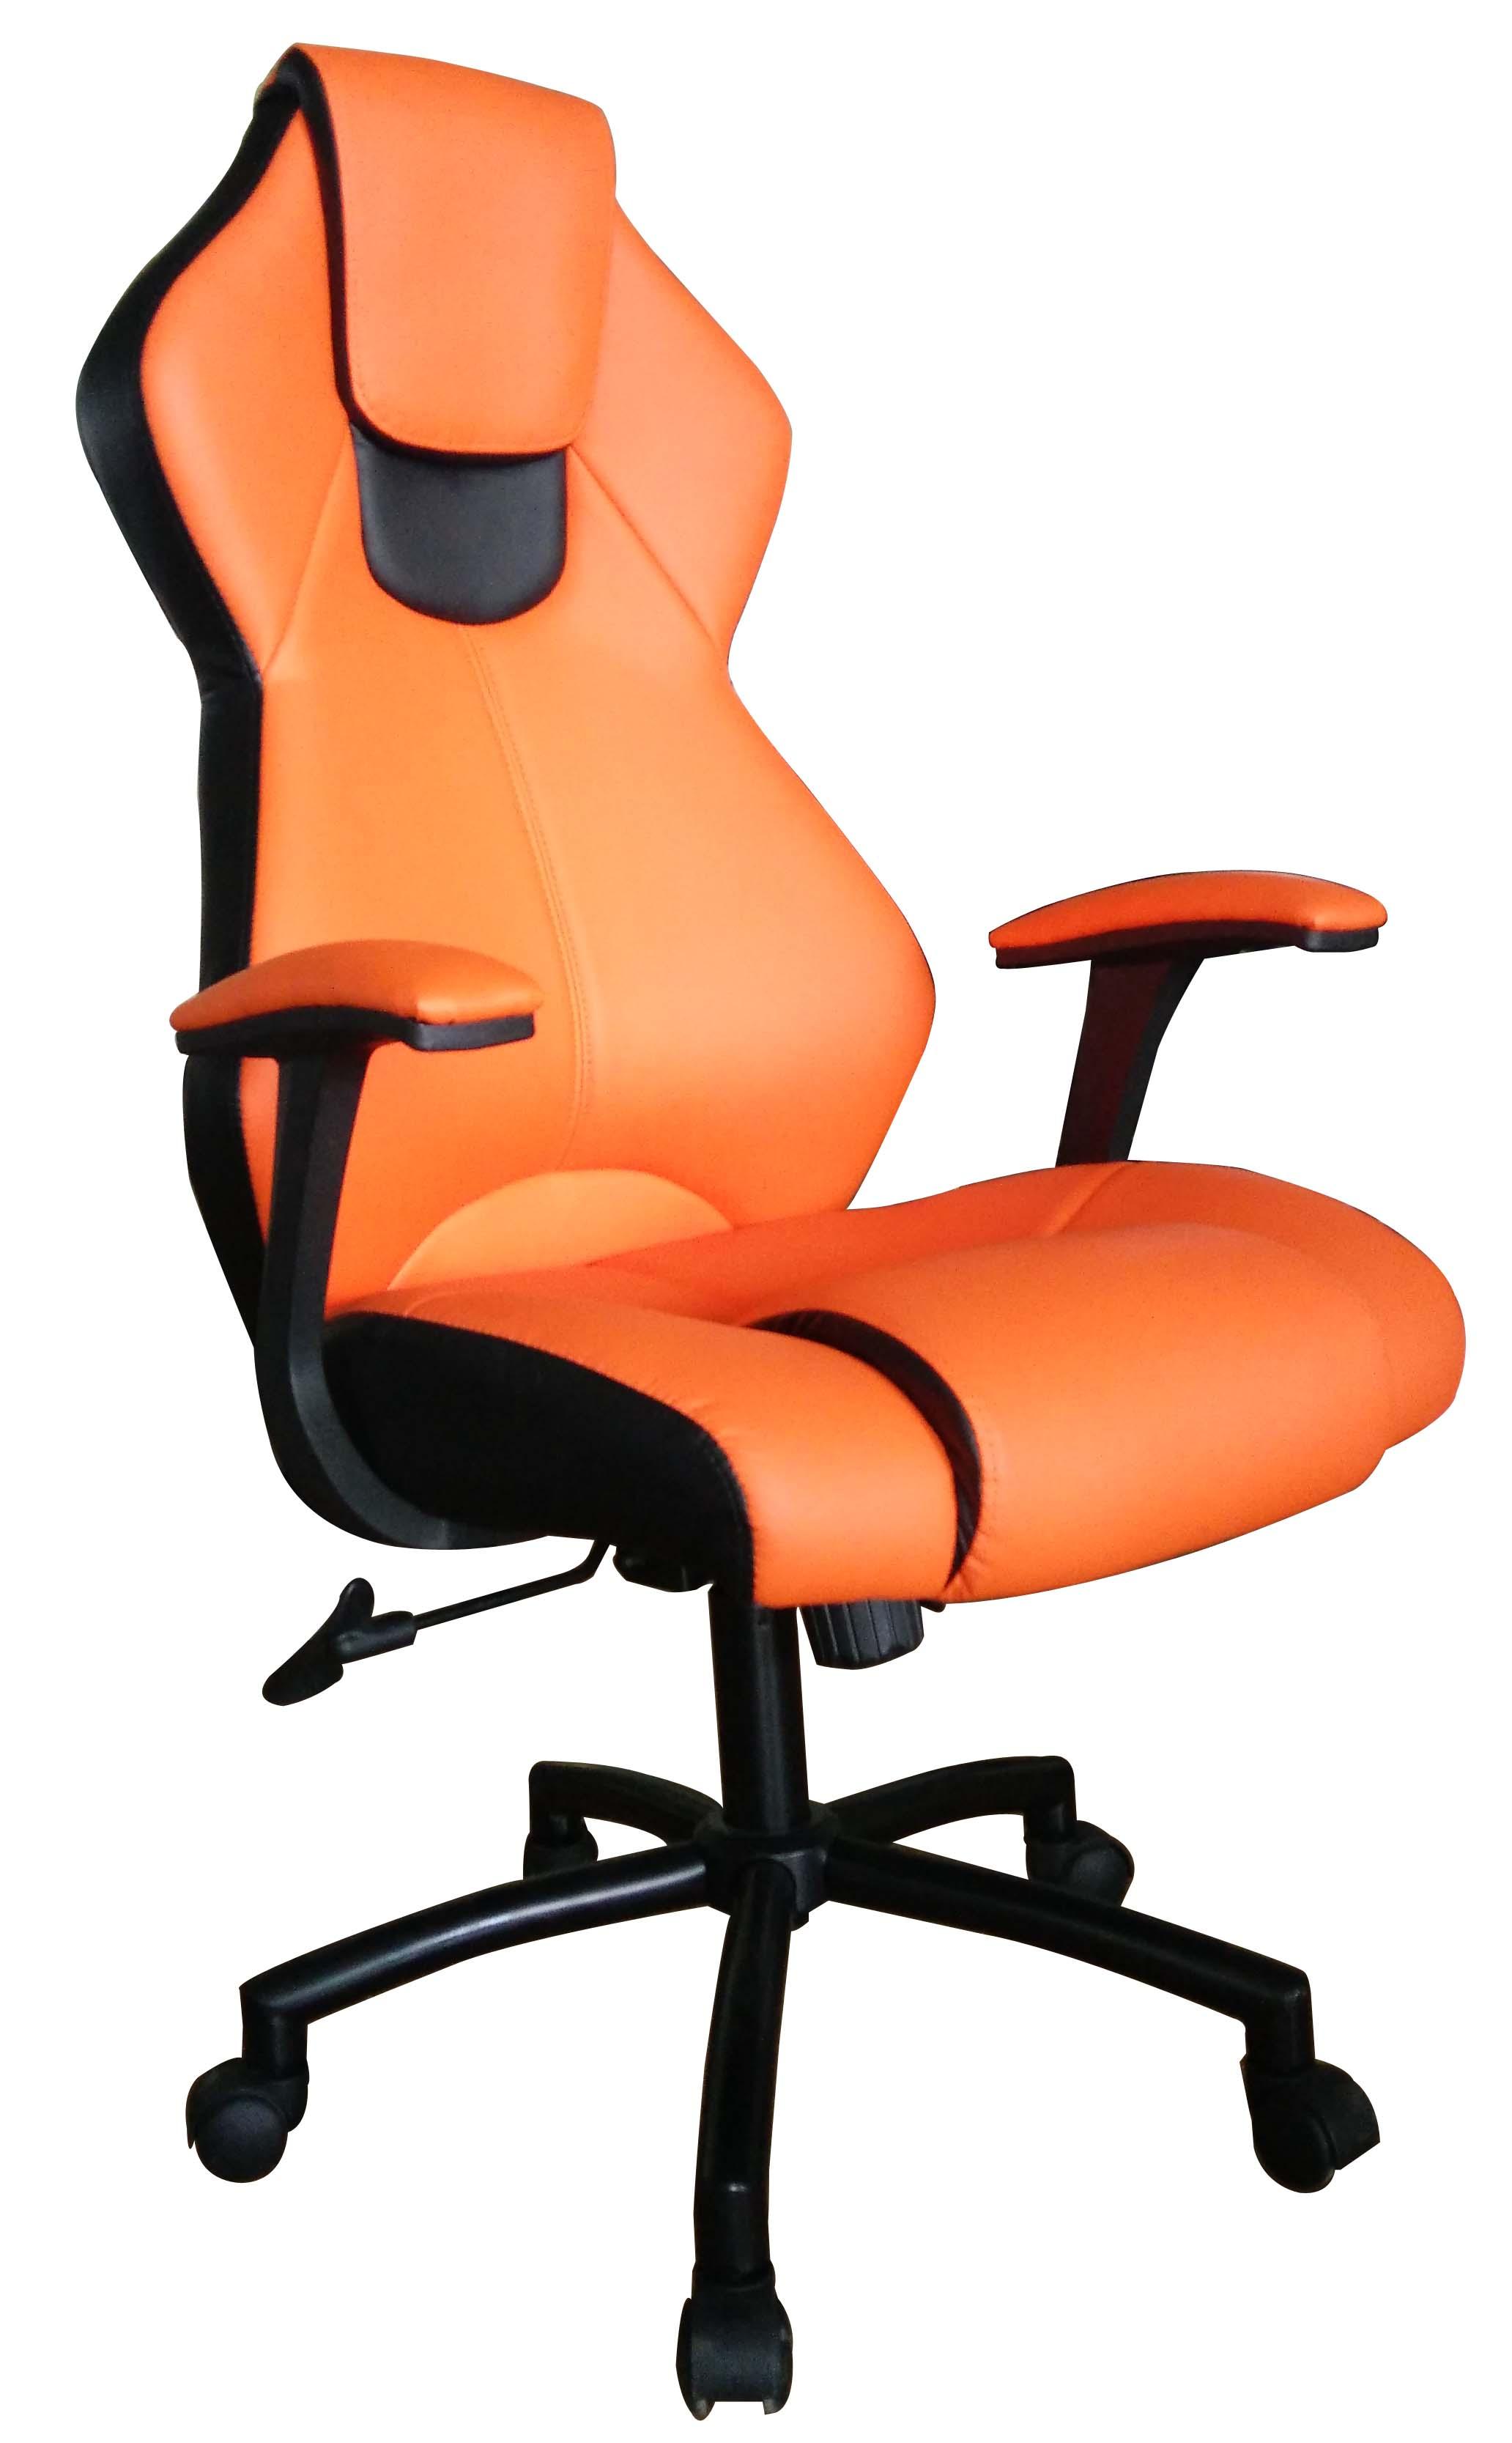 disassemble office chair. M\u0026C High Back Wholesale Director Disassemble Office Chair - Anji Furniture CO.,Ltd. E